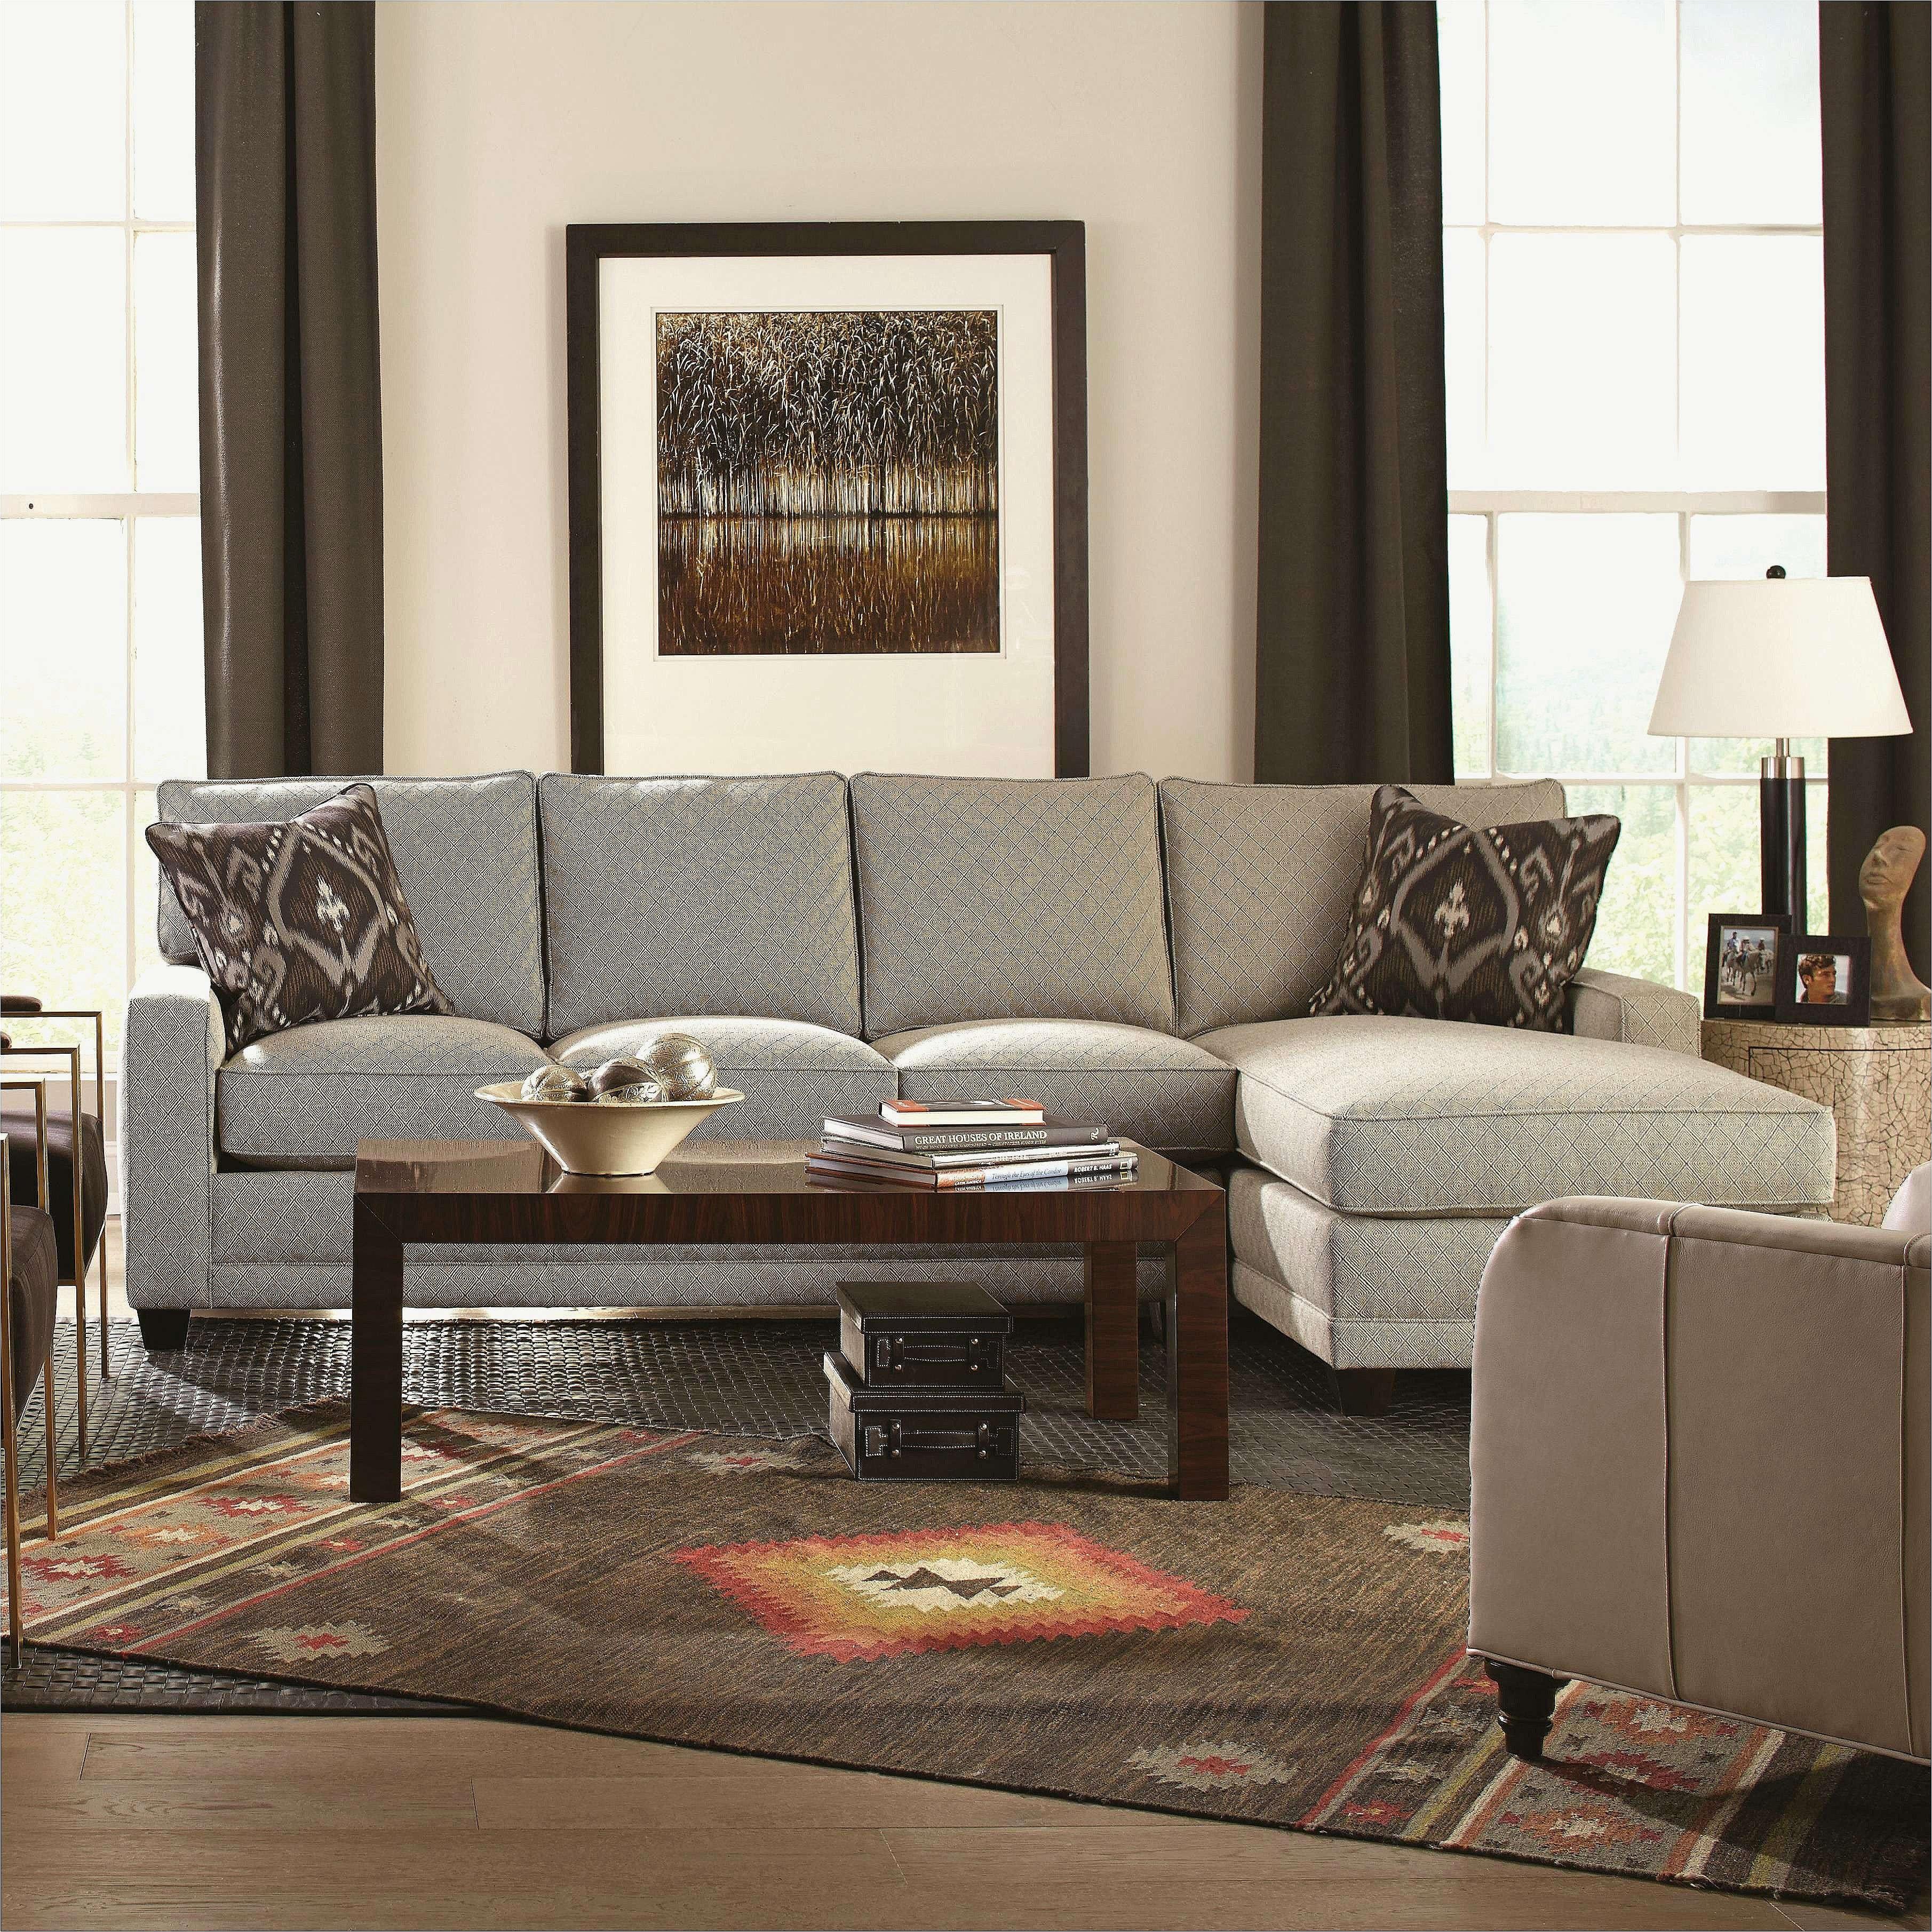 home decor furniture outlet inspirational modern furniture outlet pics of home decor furniture outlet inspirational modern